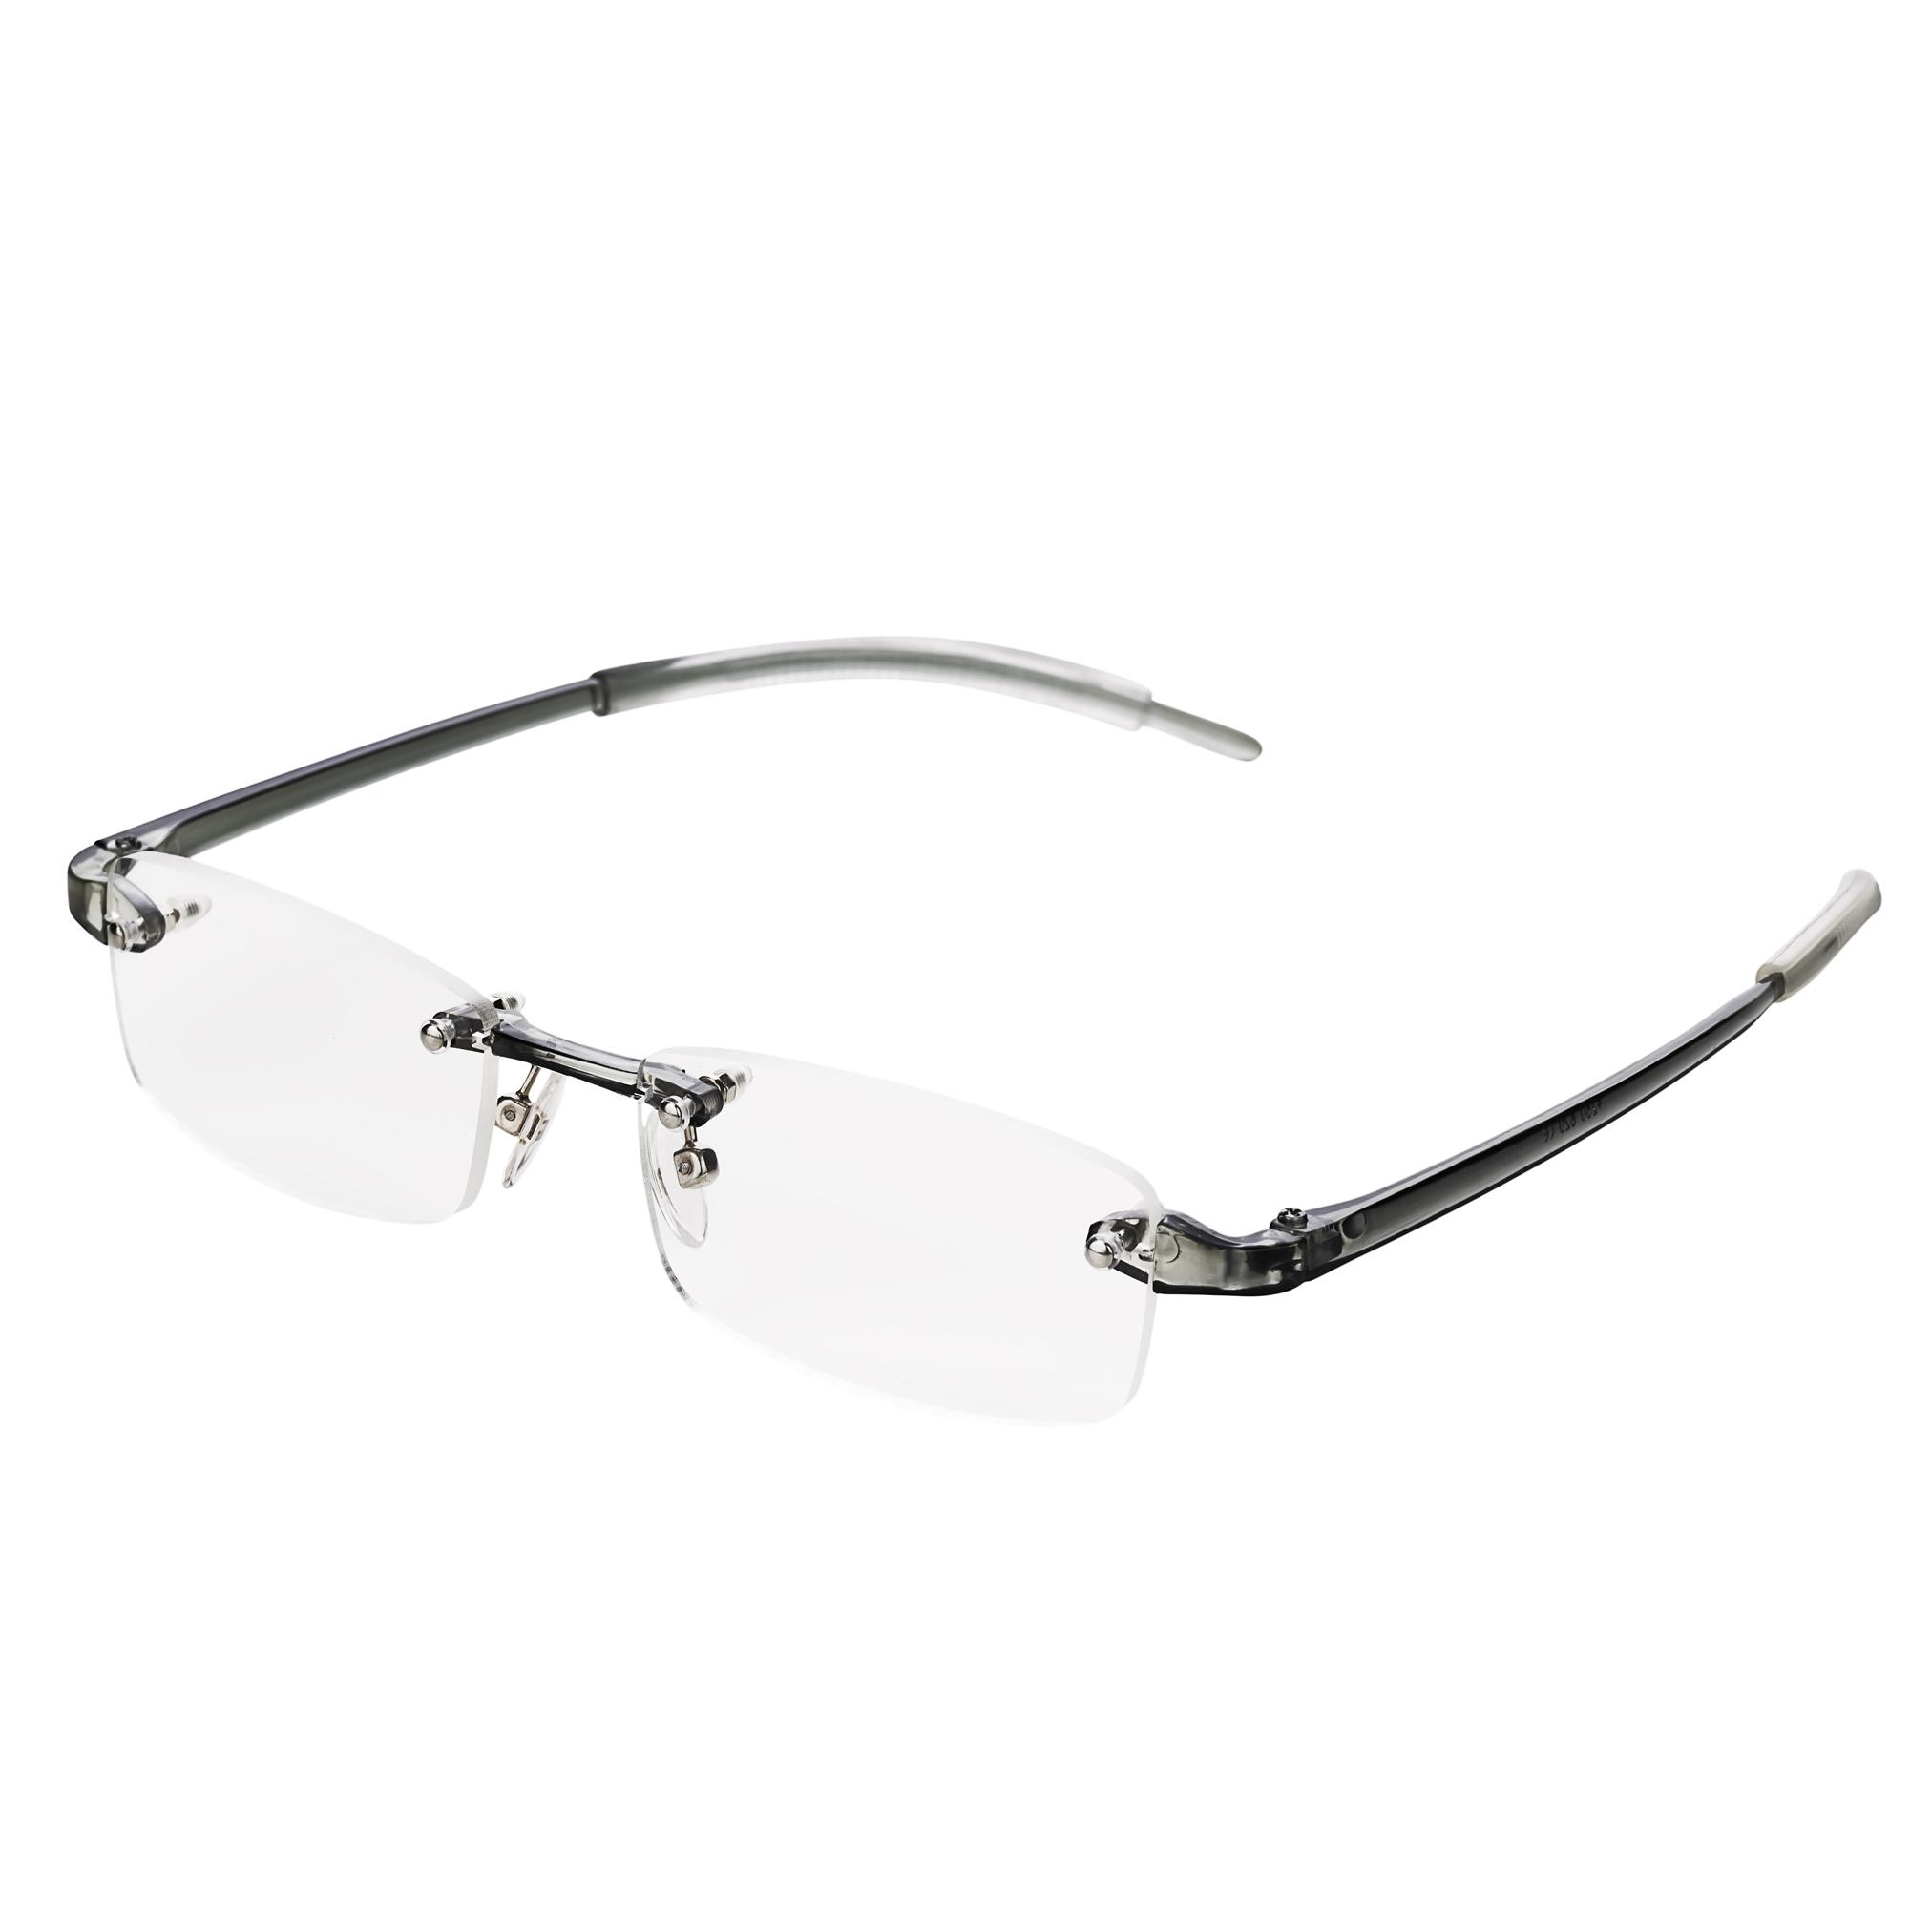 4af6bca9f5 Memoflex Reading Glasses